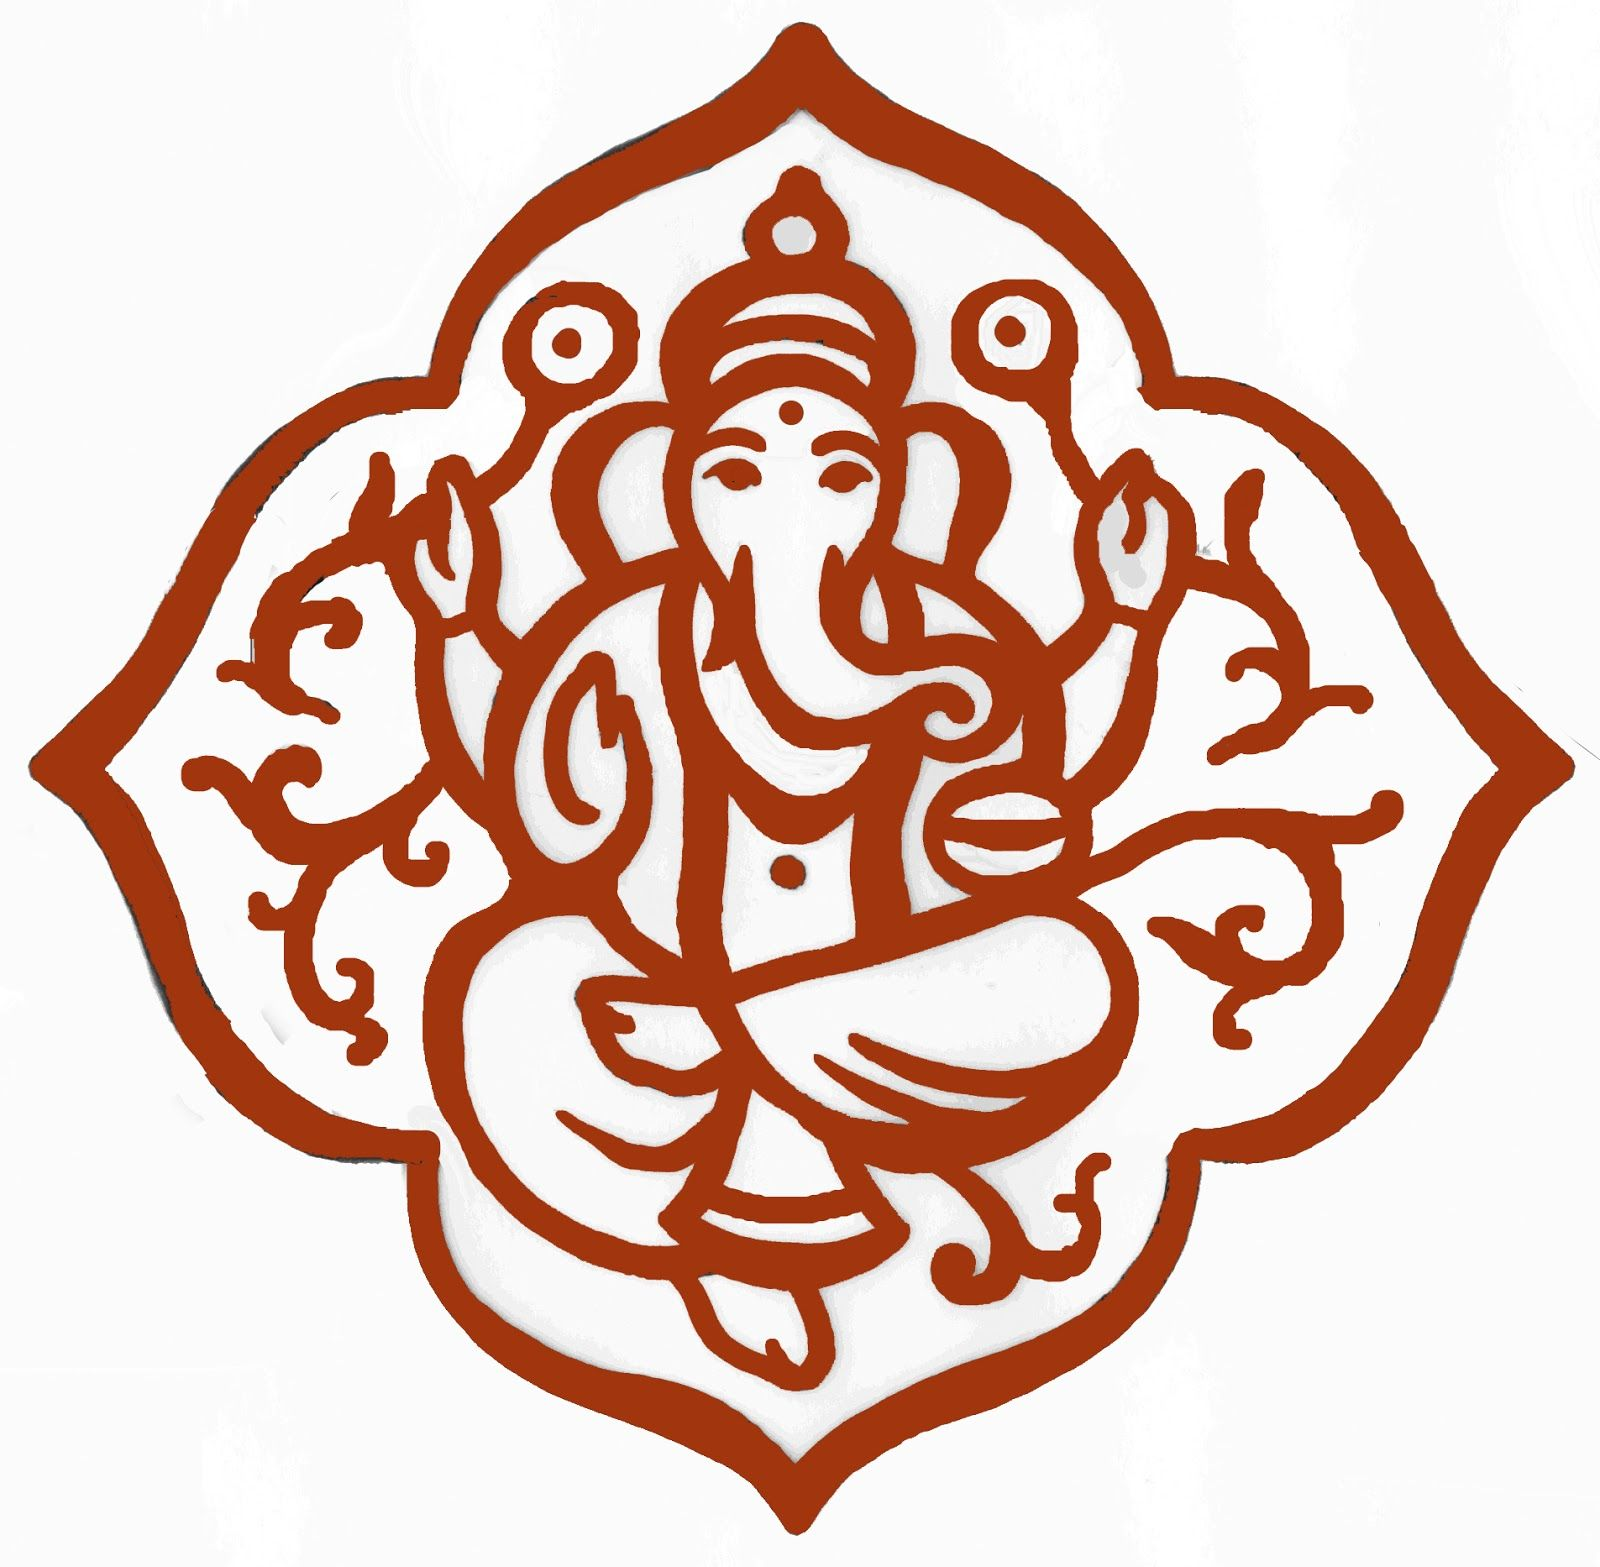 11 ganesha tattoo designs ideas and samples - Ganesha Design By Graham Brown